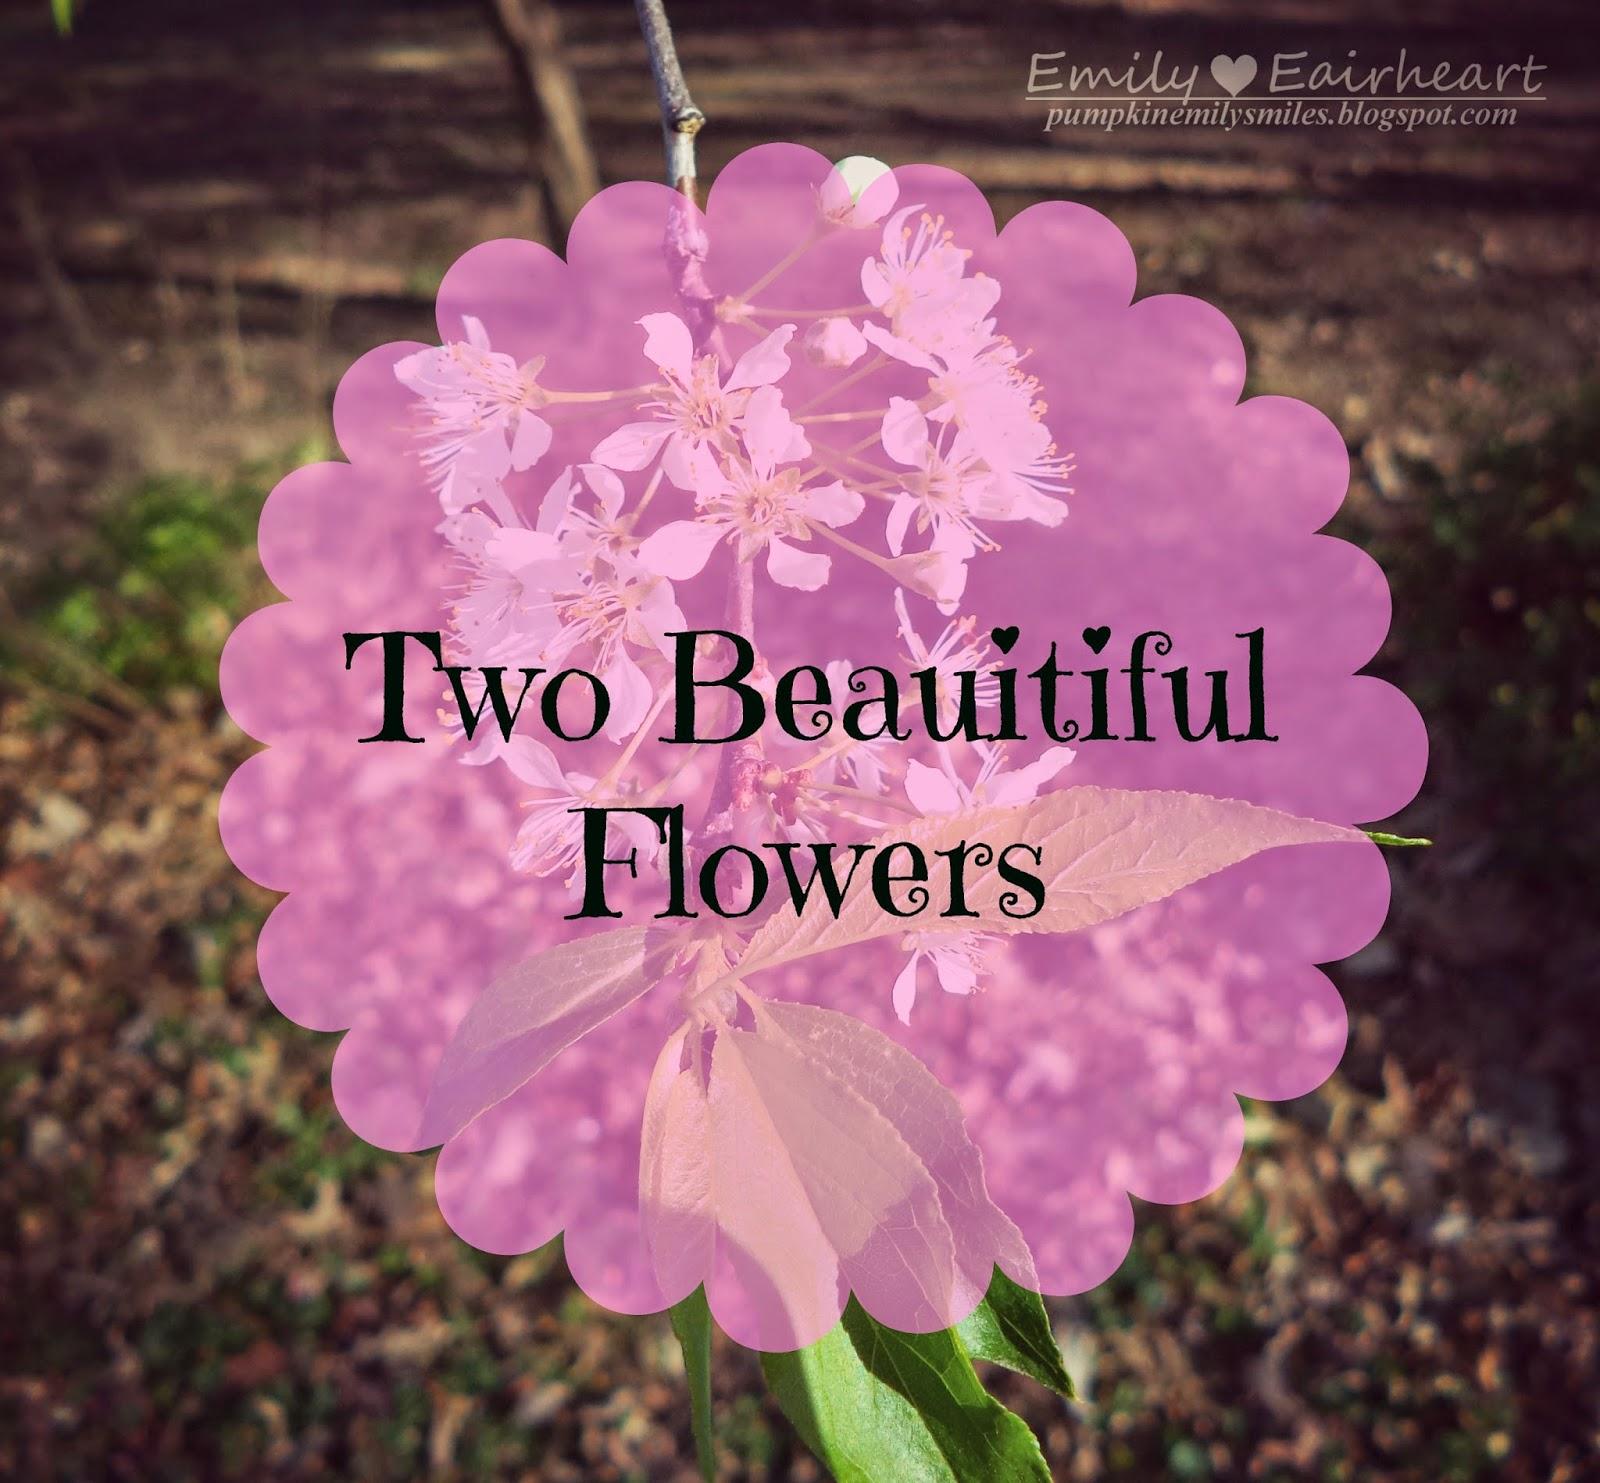 Two Beautiful Flowers Pumpkin Emily